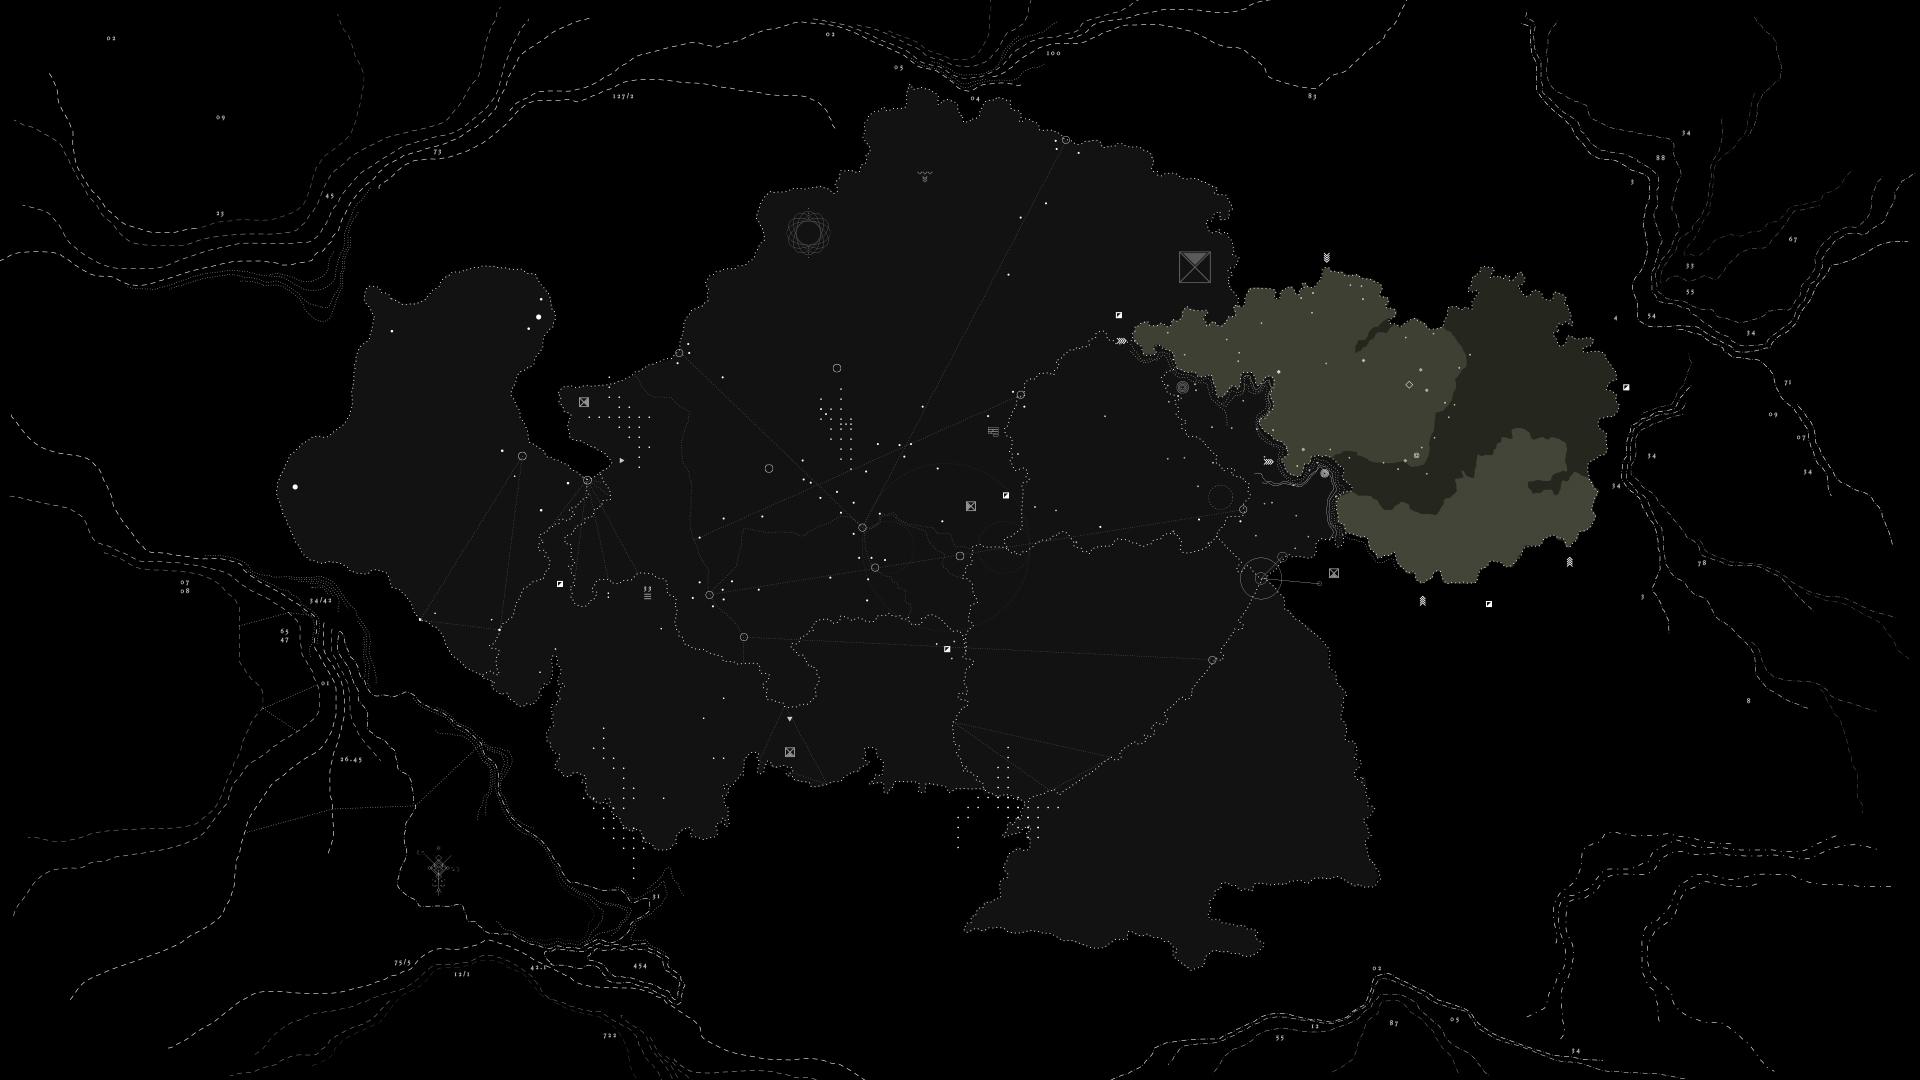 Cosmodrome_Plaguelands_Overlay_01.jpg